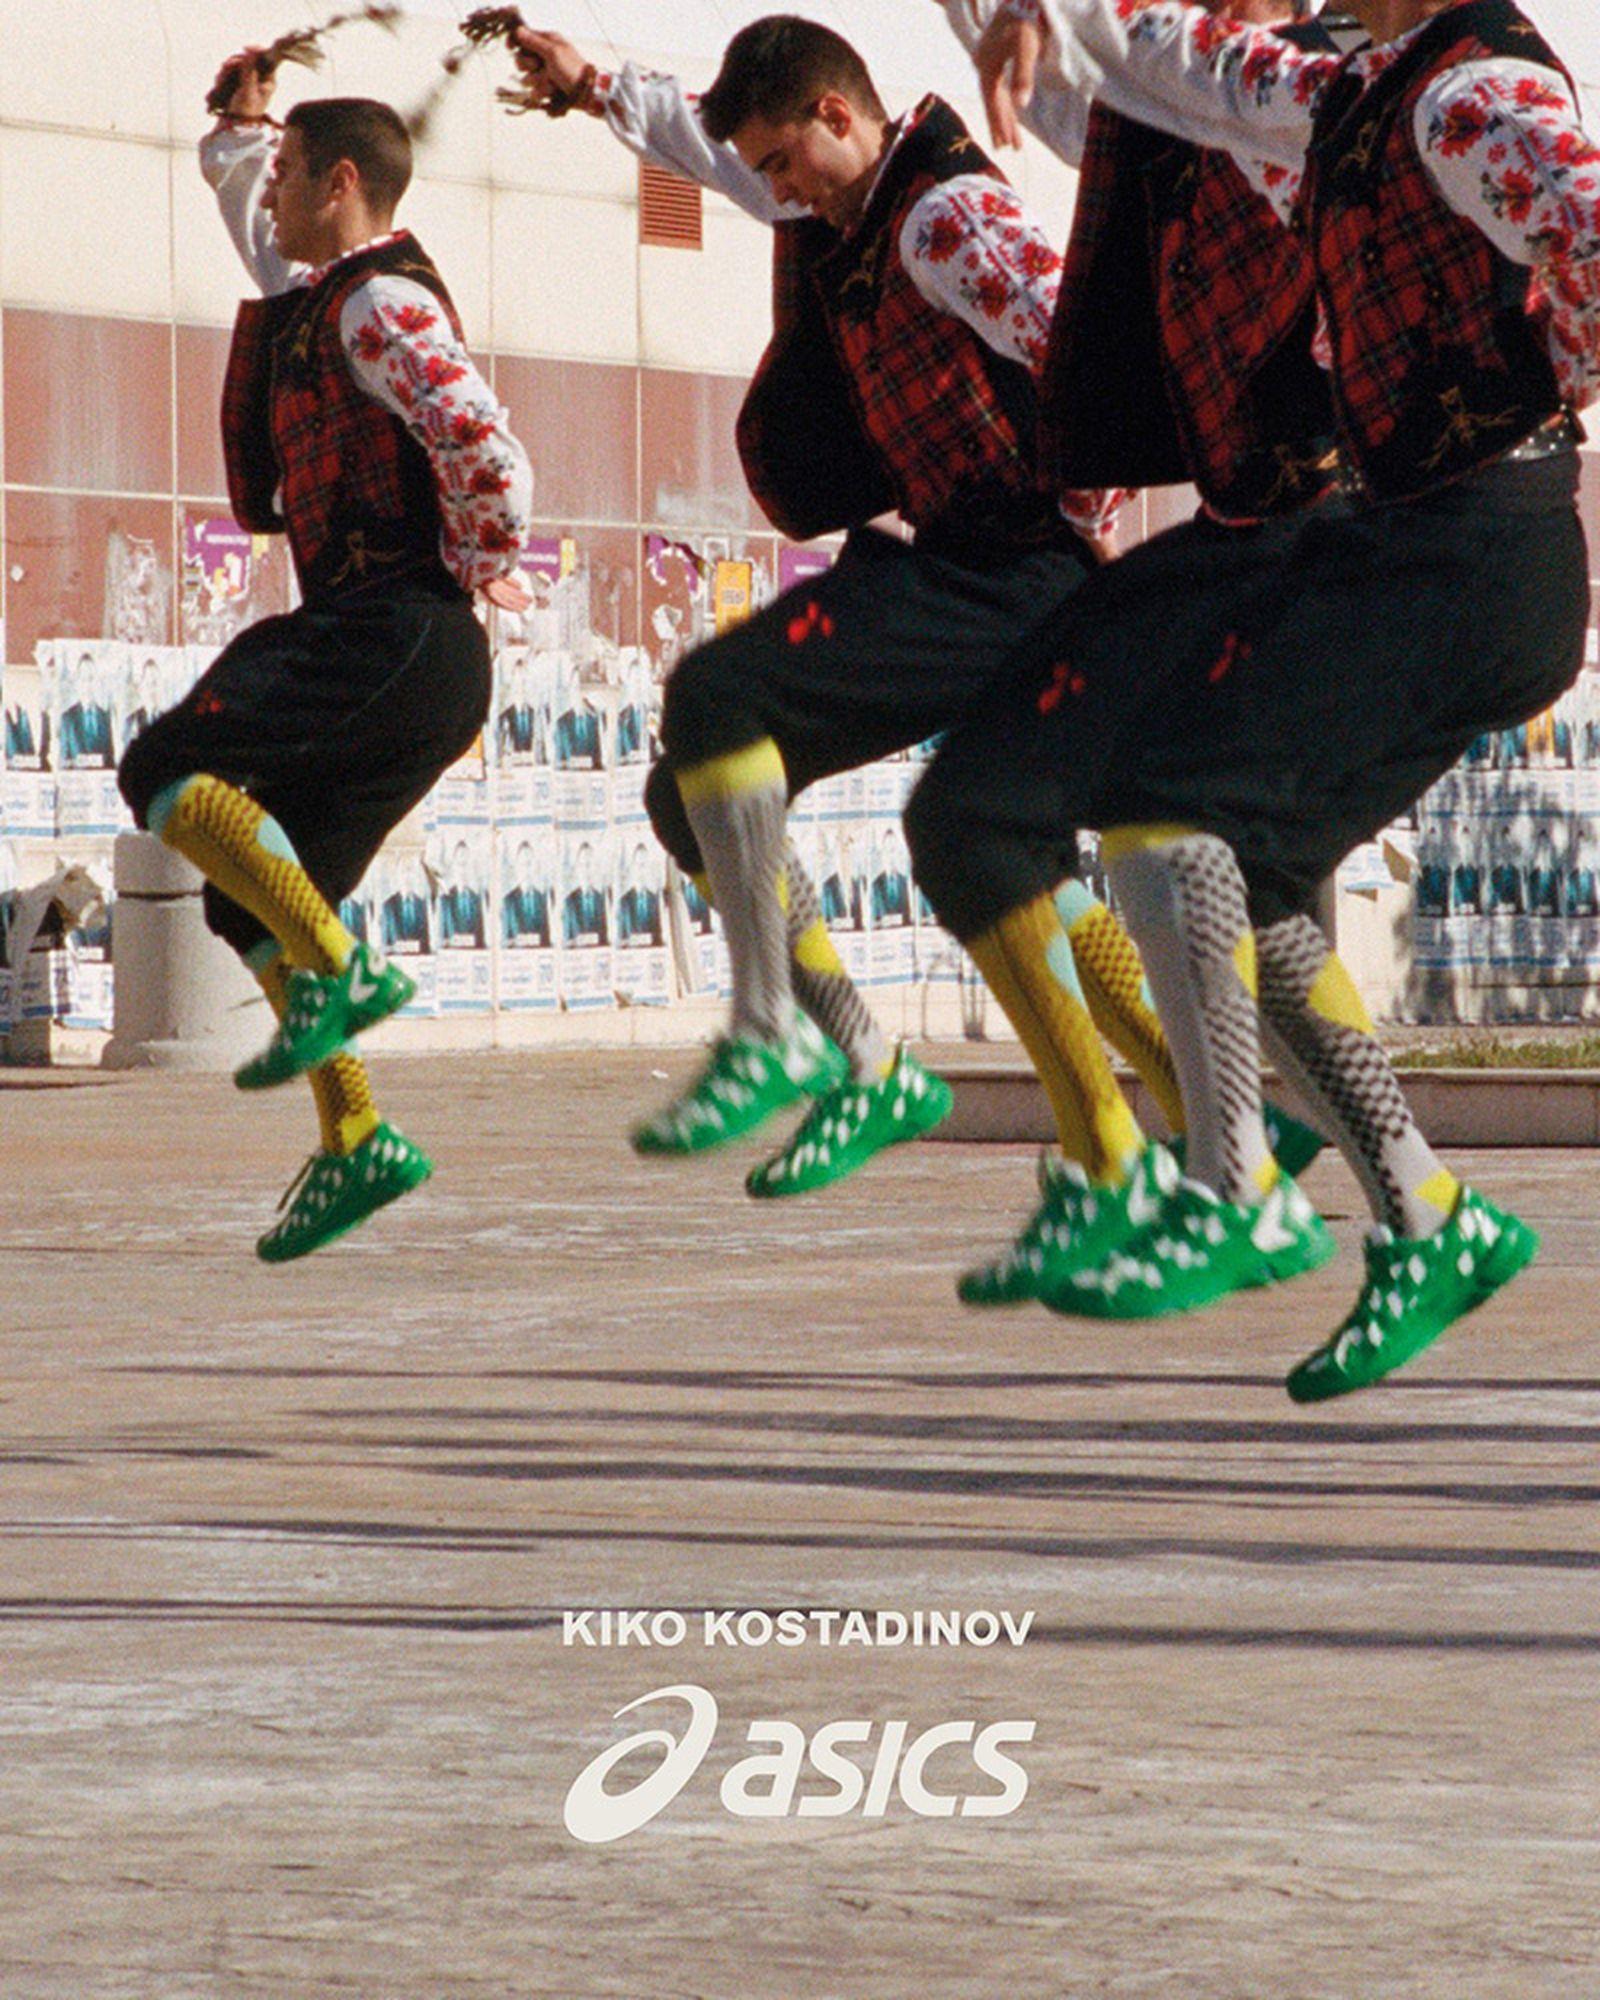 kiko-kostadinov-asics-partnership-announcement-14